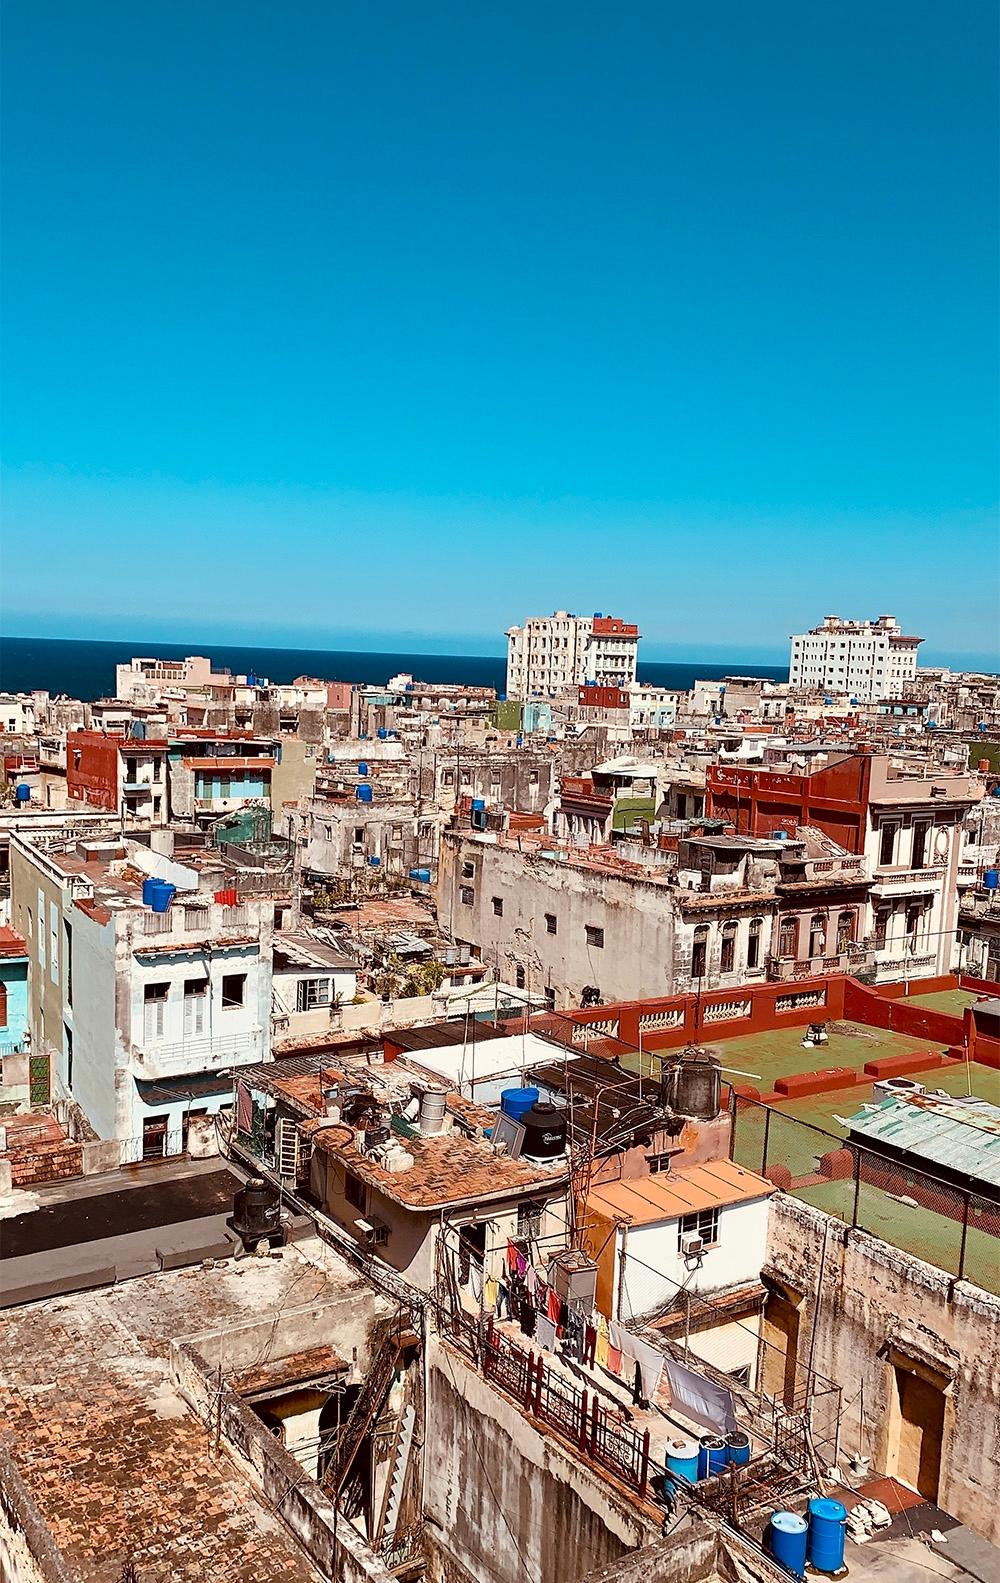 The rooftop vista of tall Havanan buildings